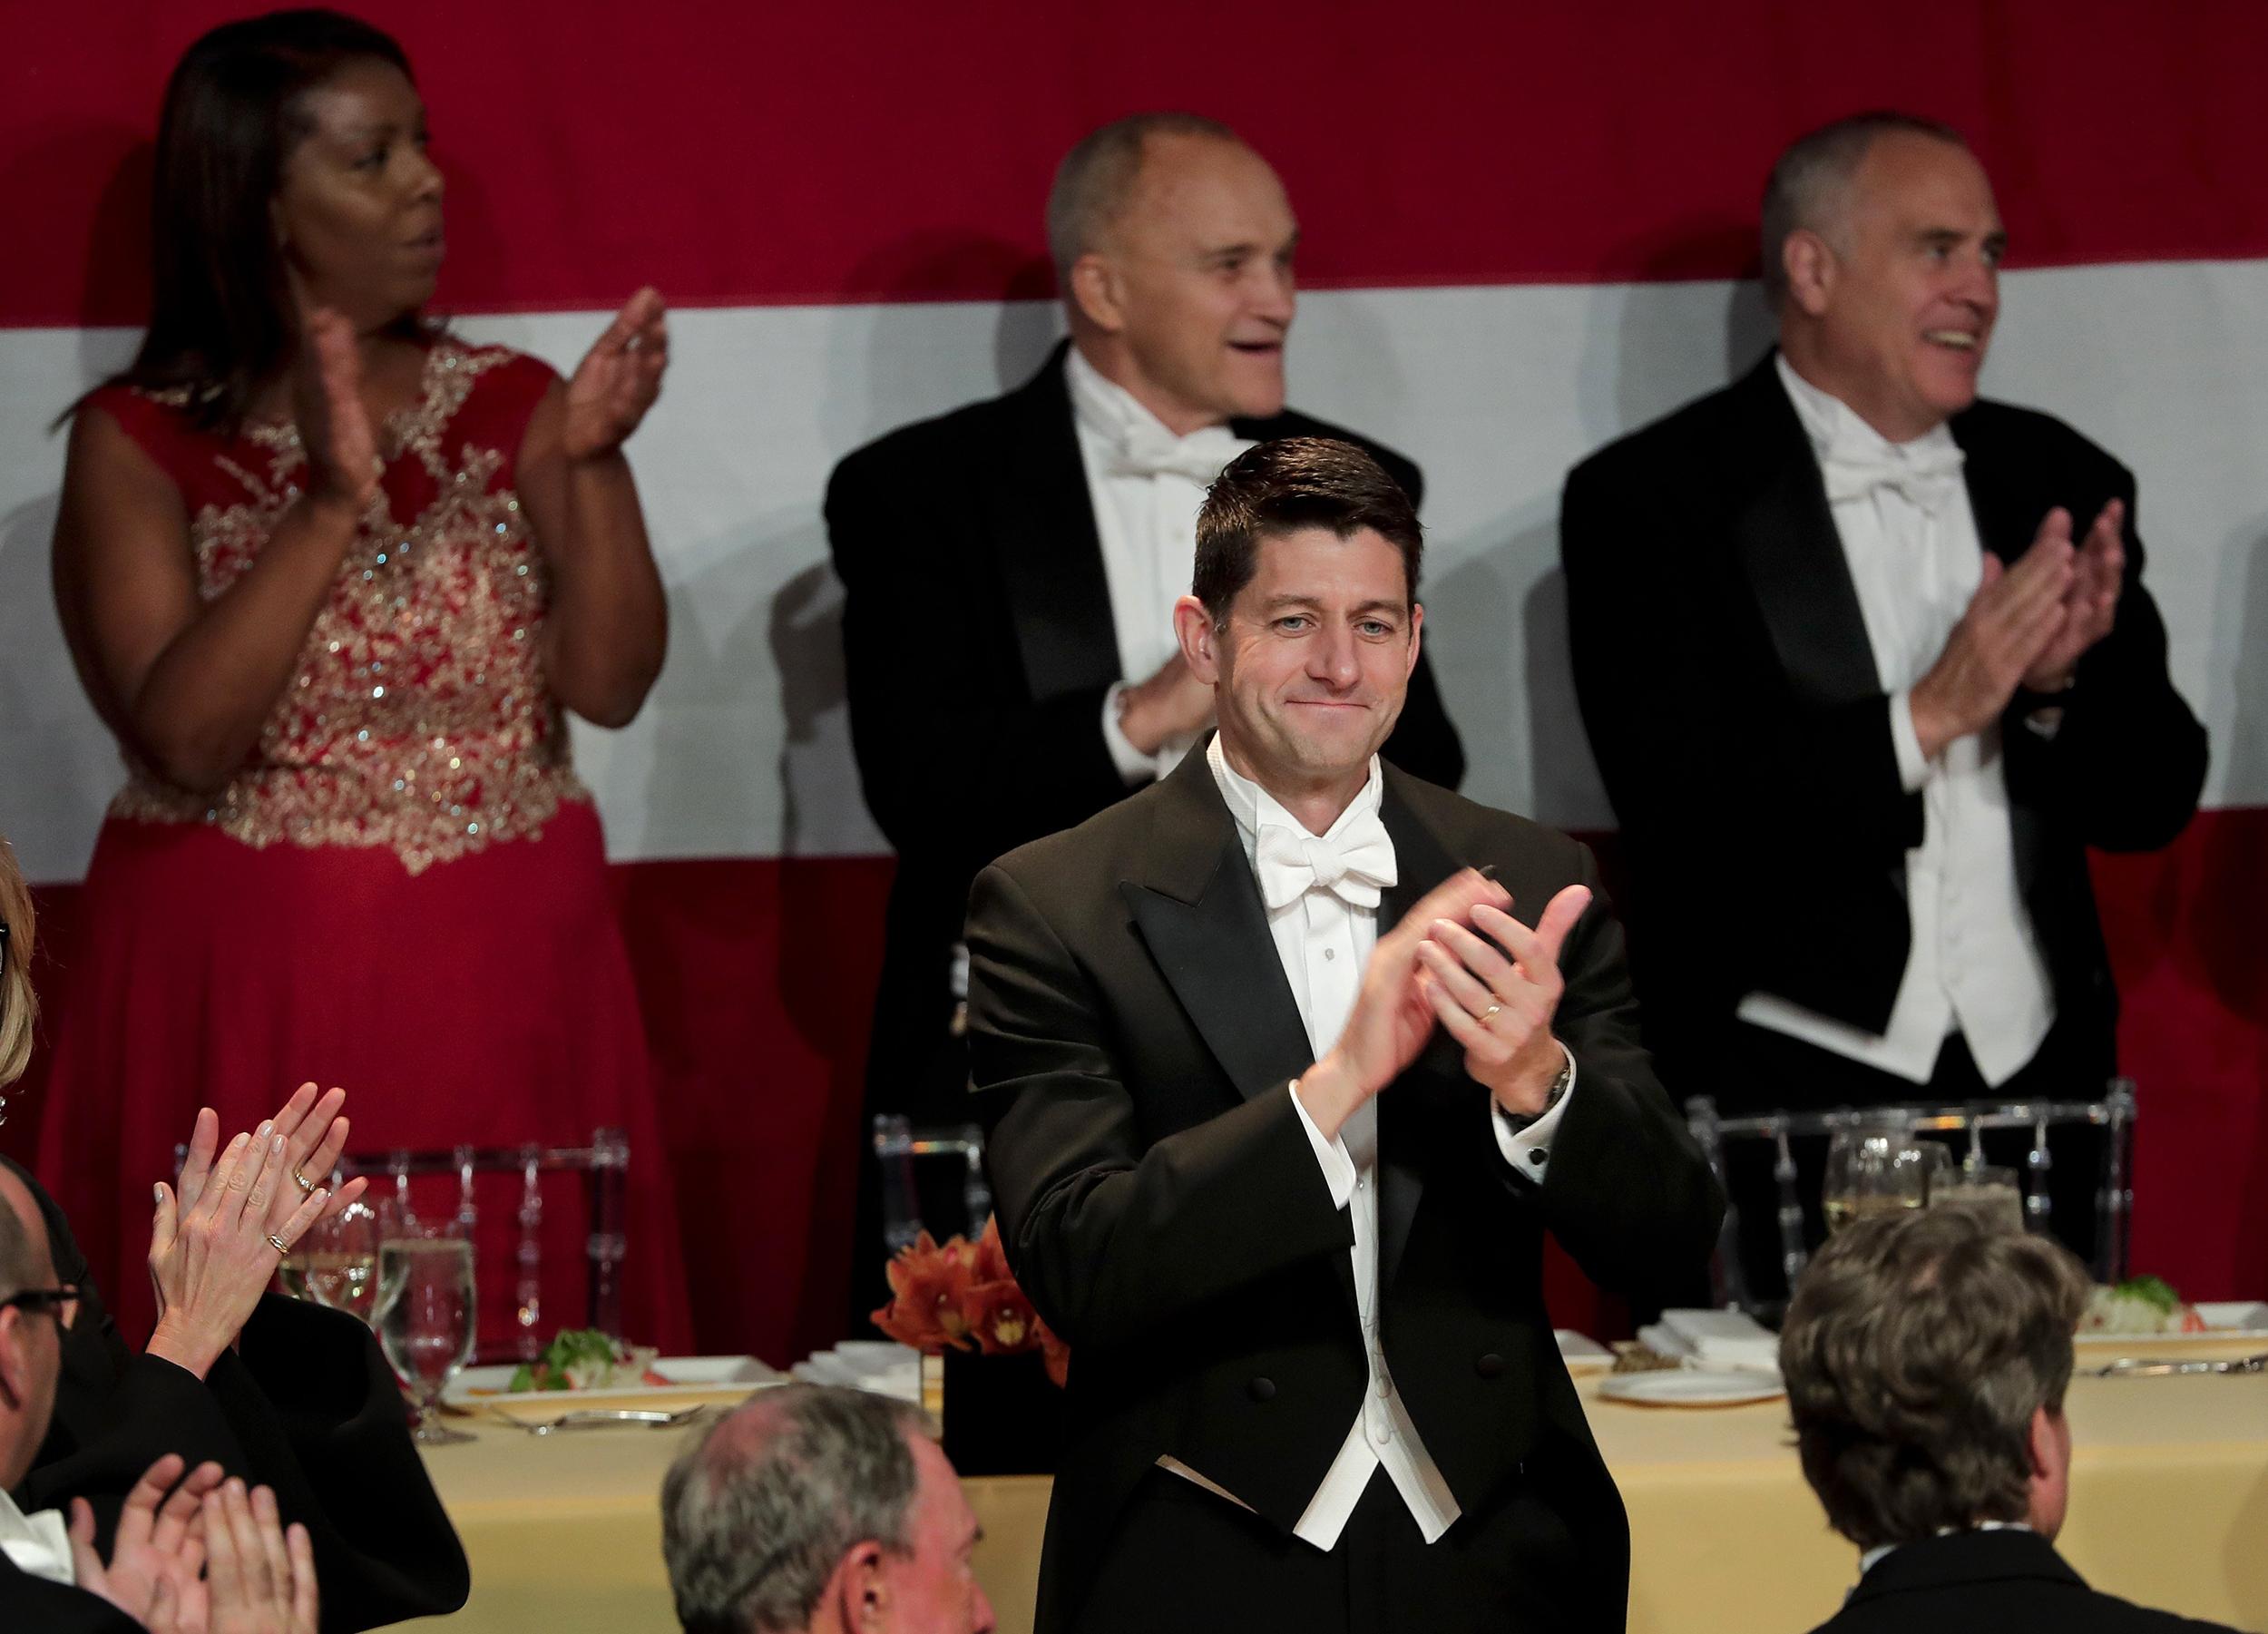 Speaker Paul Ryan Roasts President Trump at Al Smith Dinner